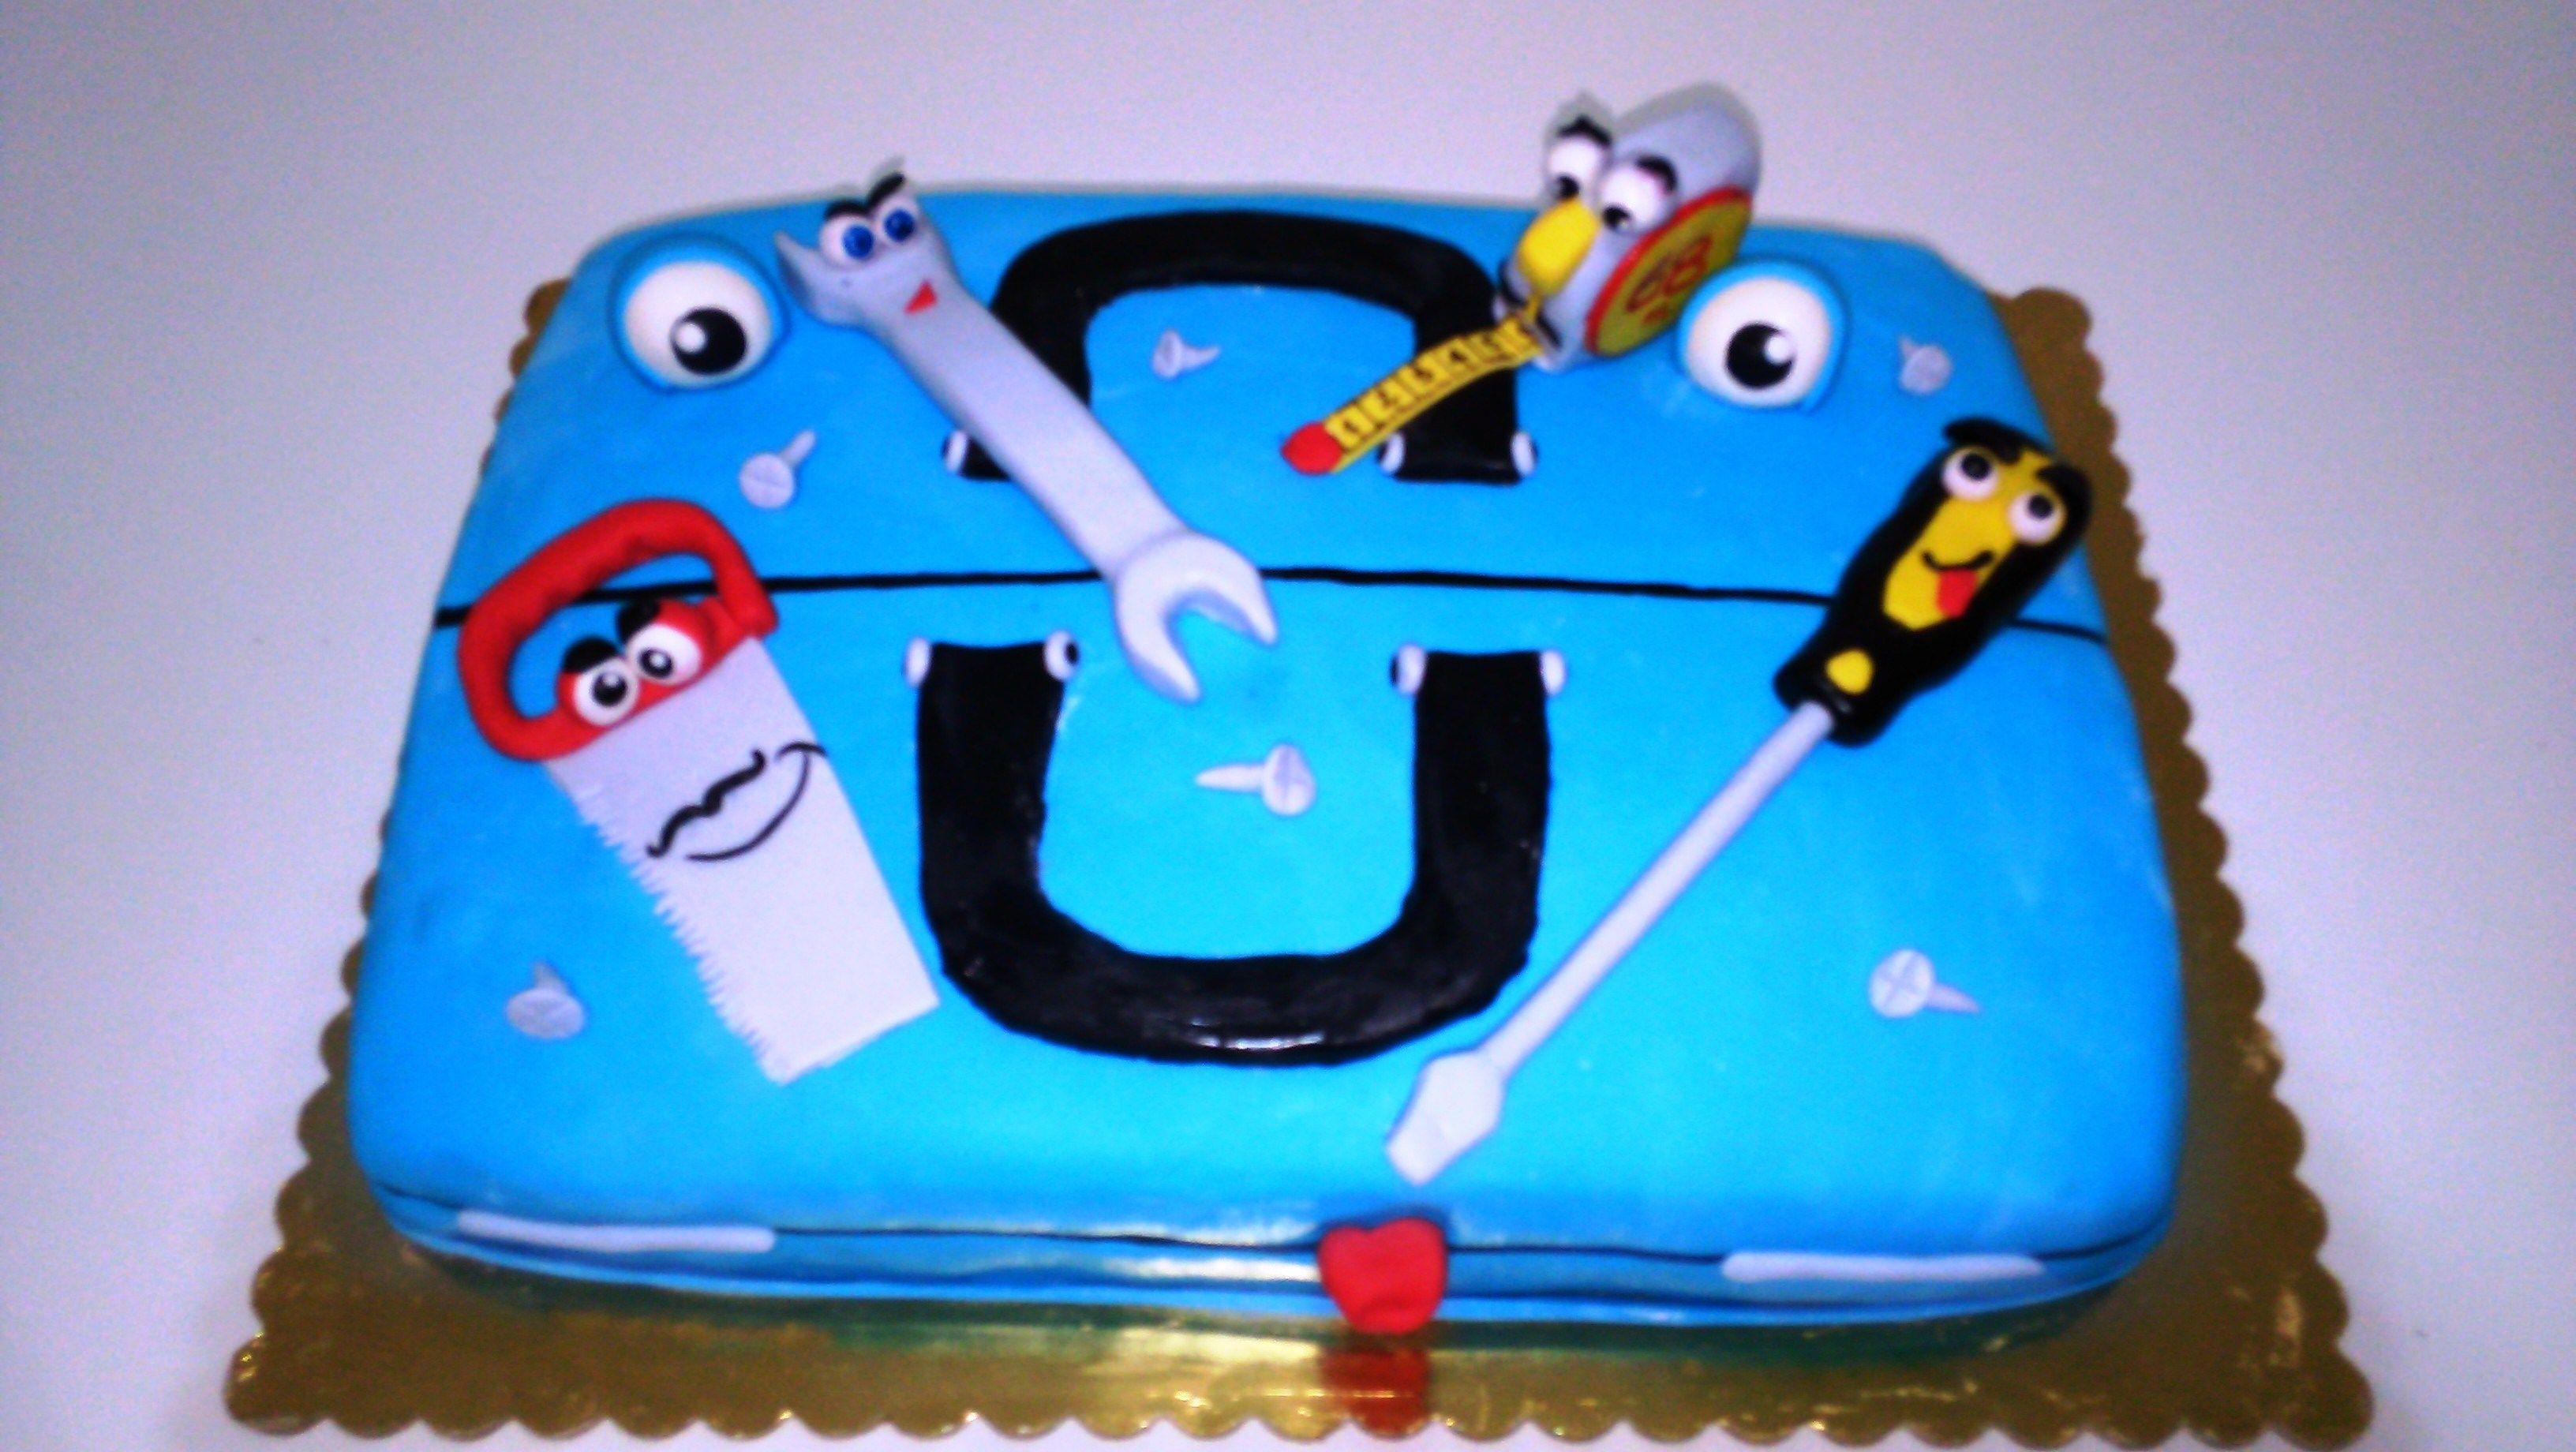 Tortacassettaattrezzi Torta Cake Toolboxcake